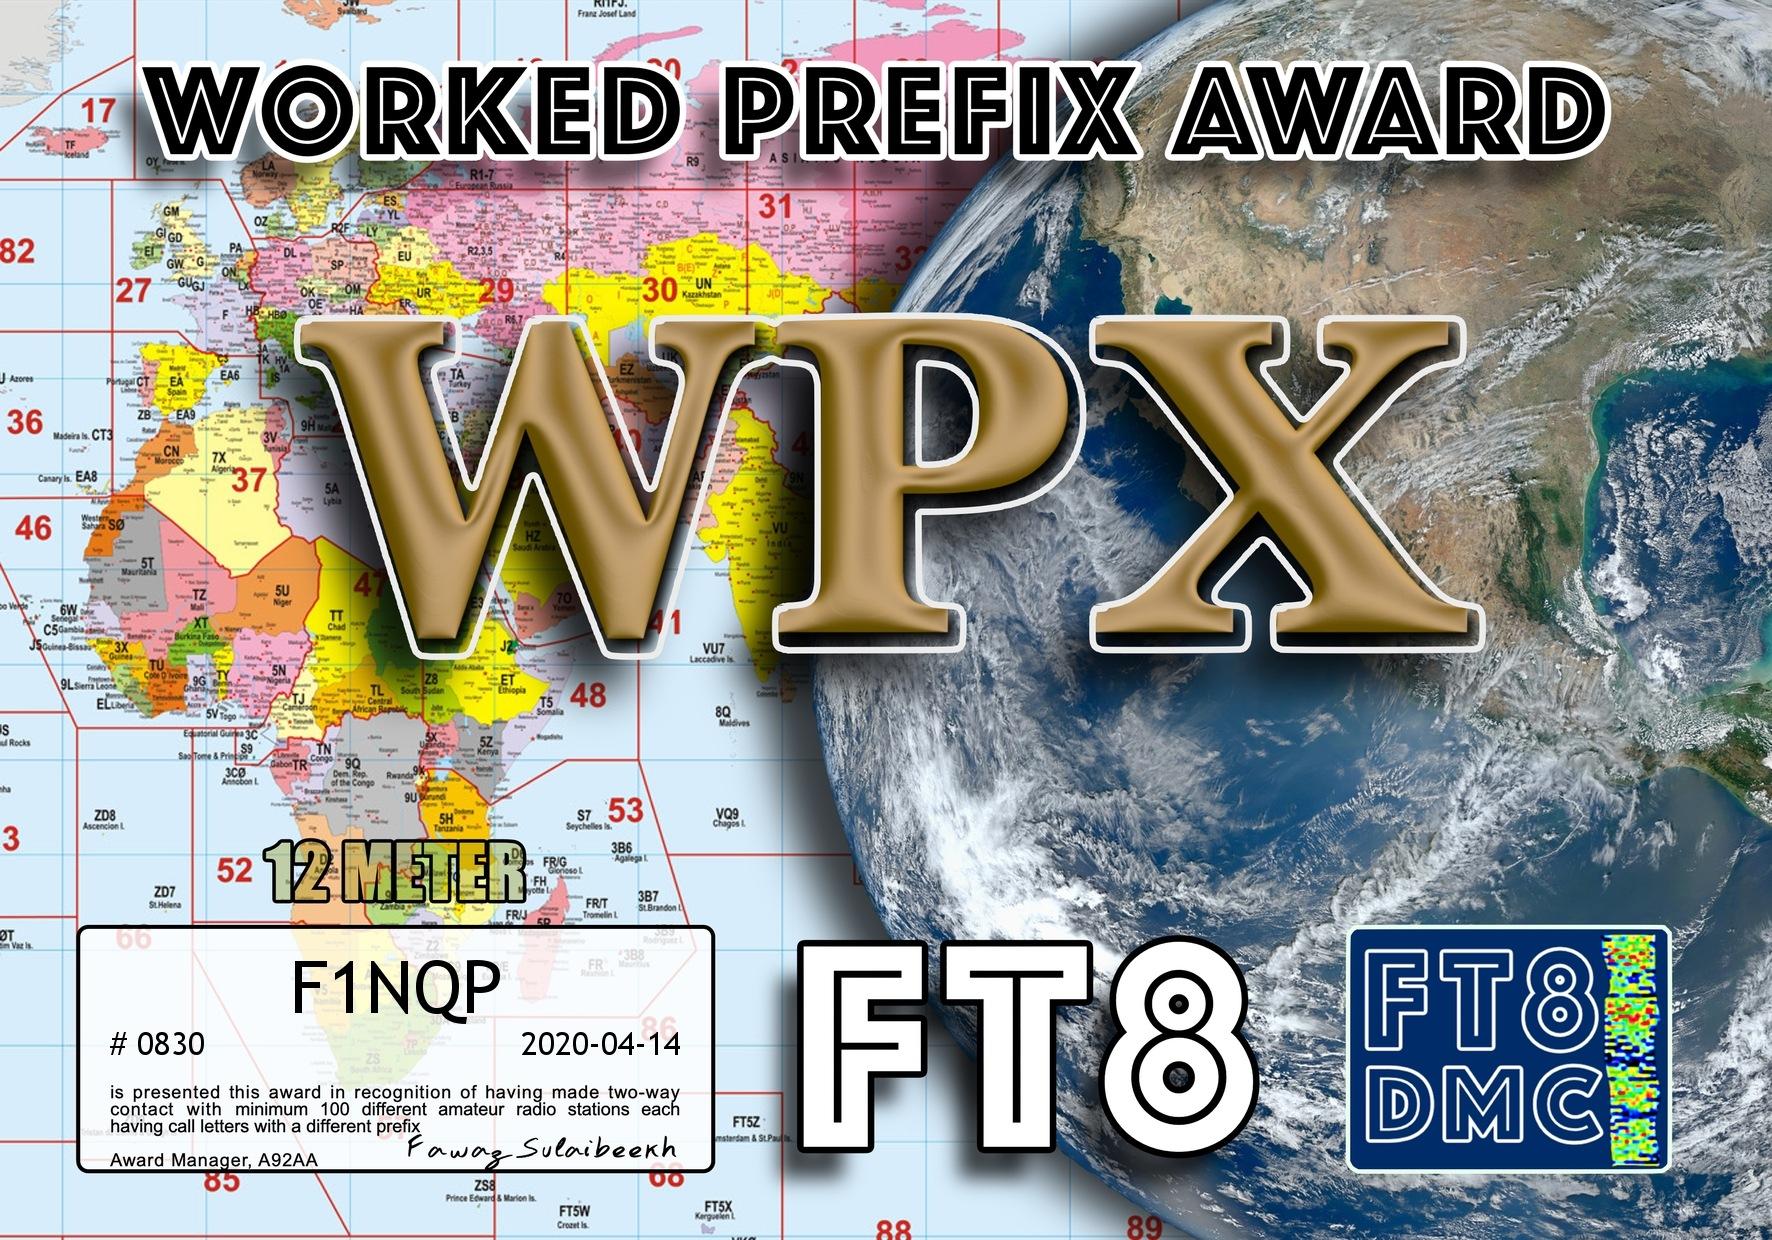 F1NQP-WPX12-100_FT8DMC.jpg